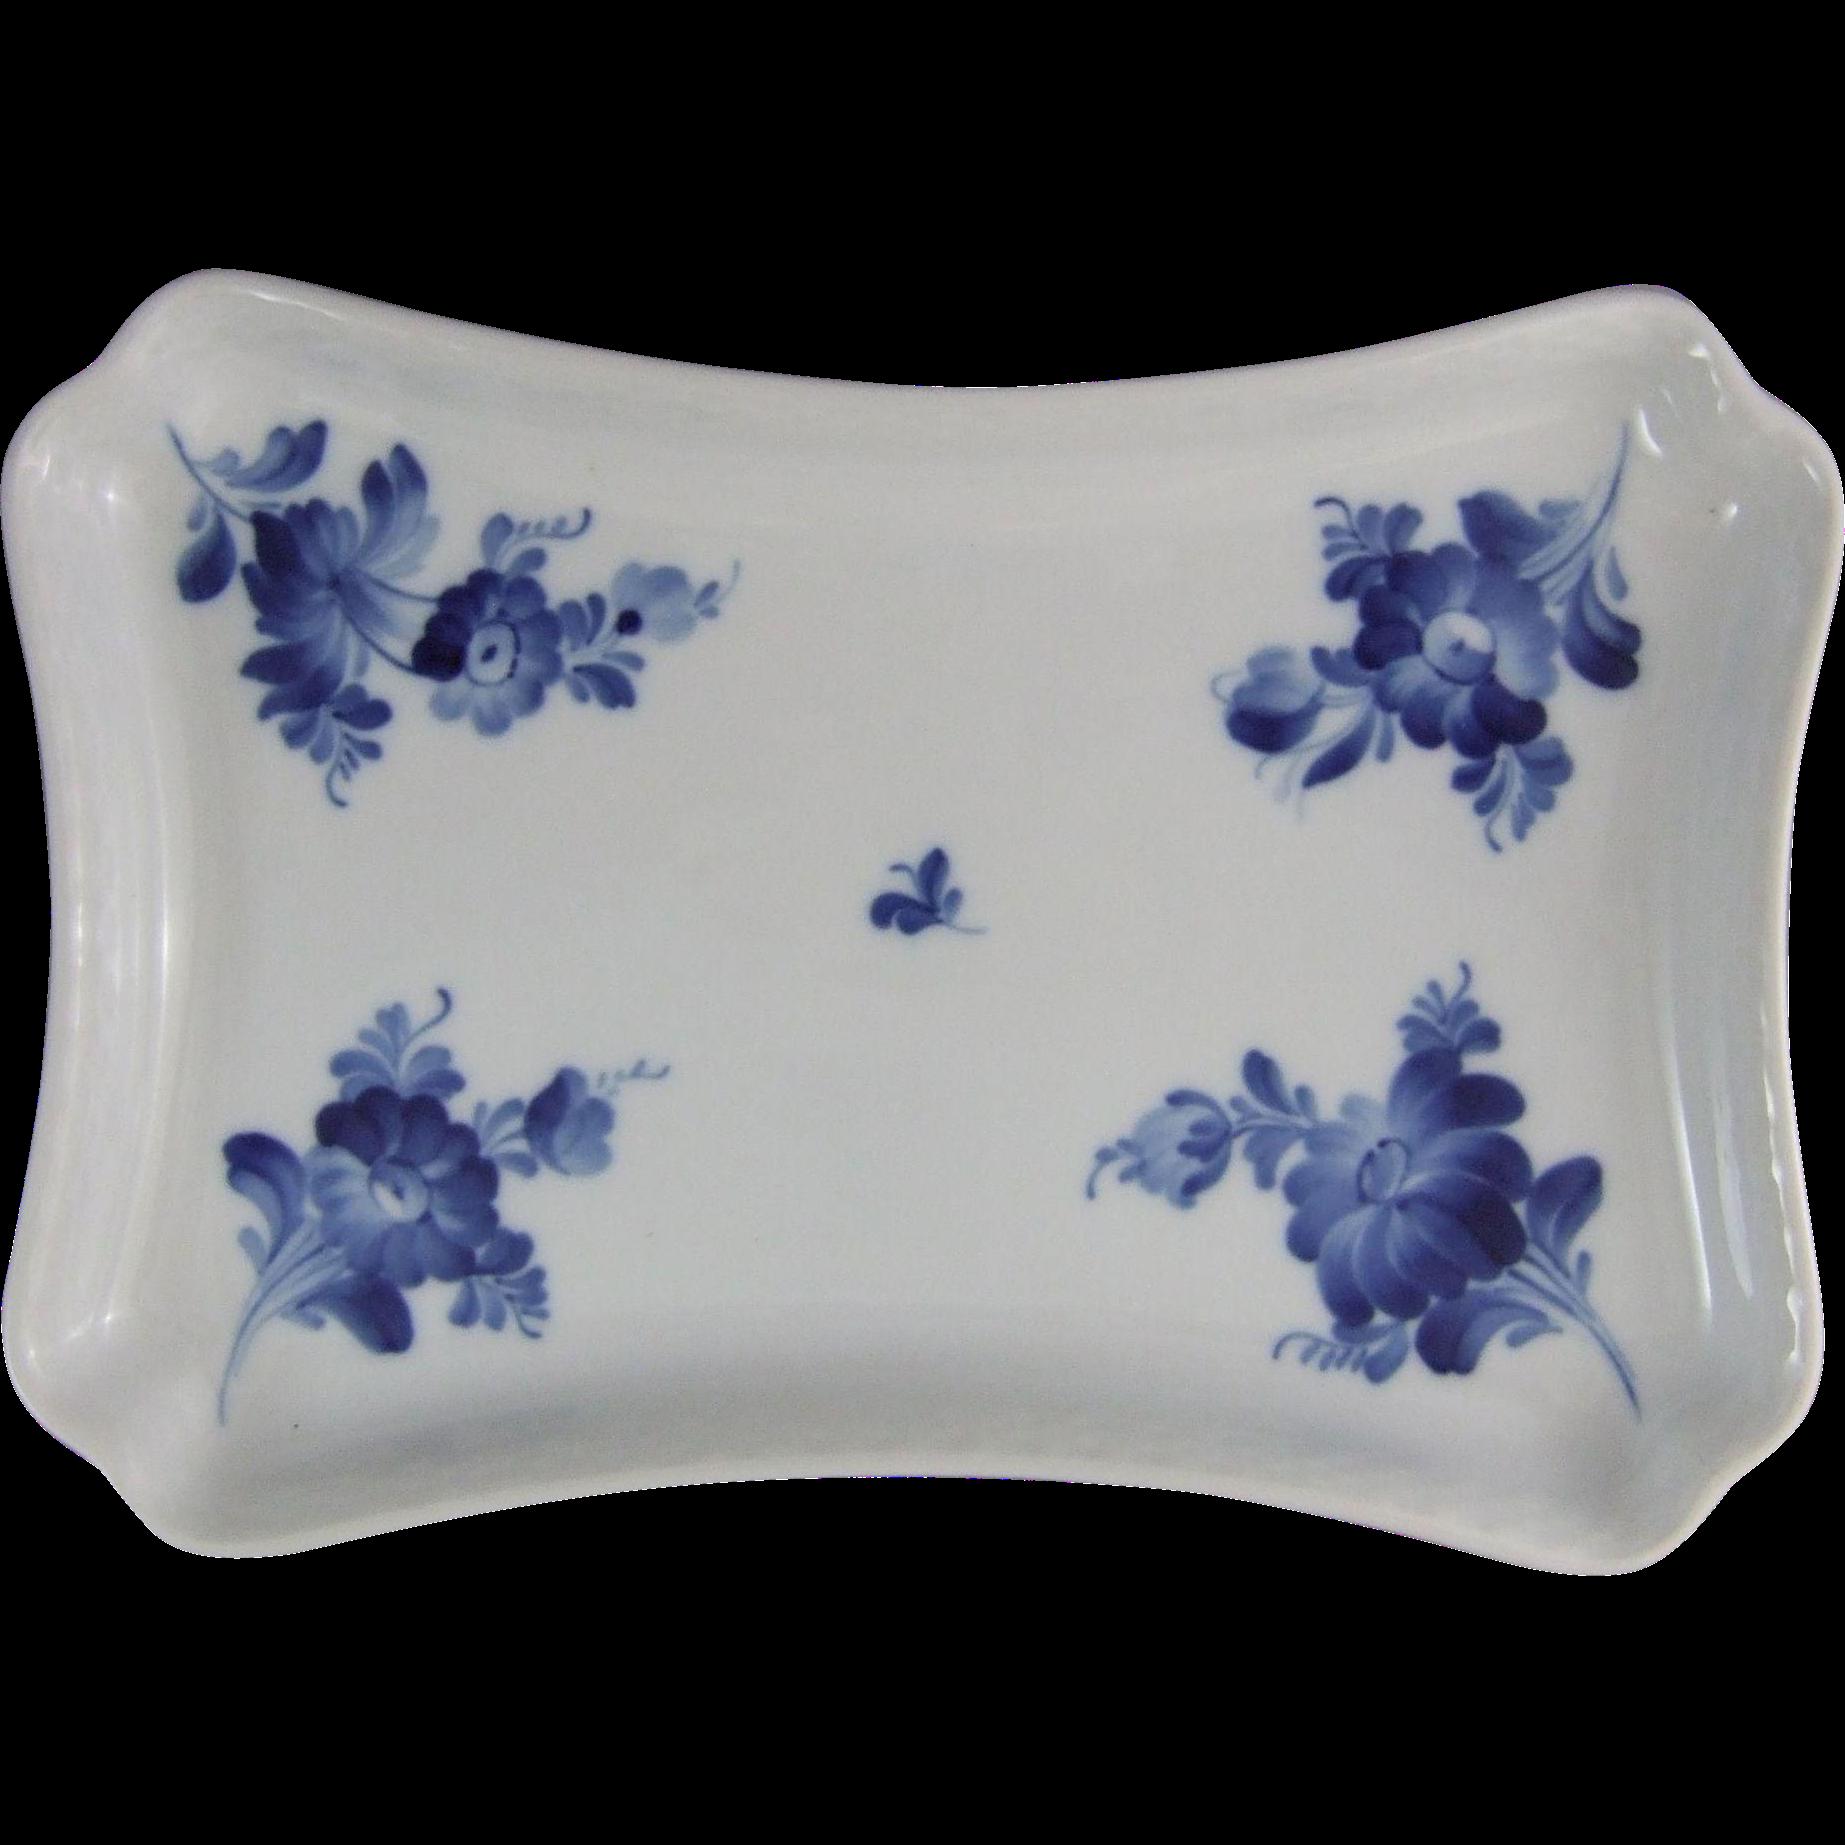 Royal Copenhagen Blue Flower Rectangular Tray 1 106 364